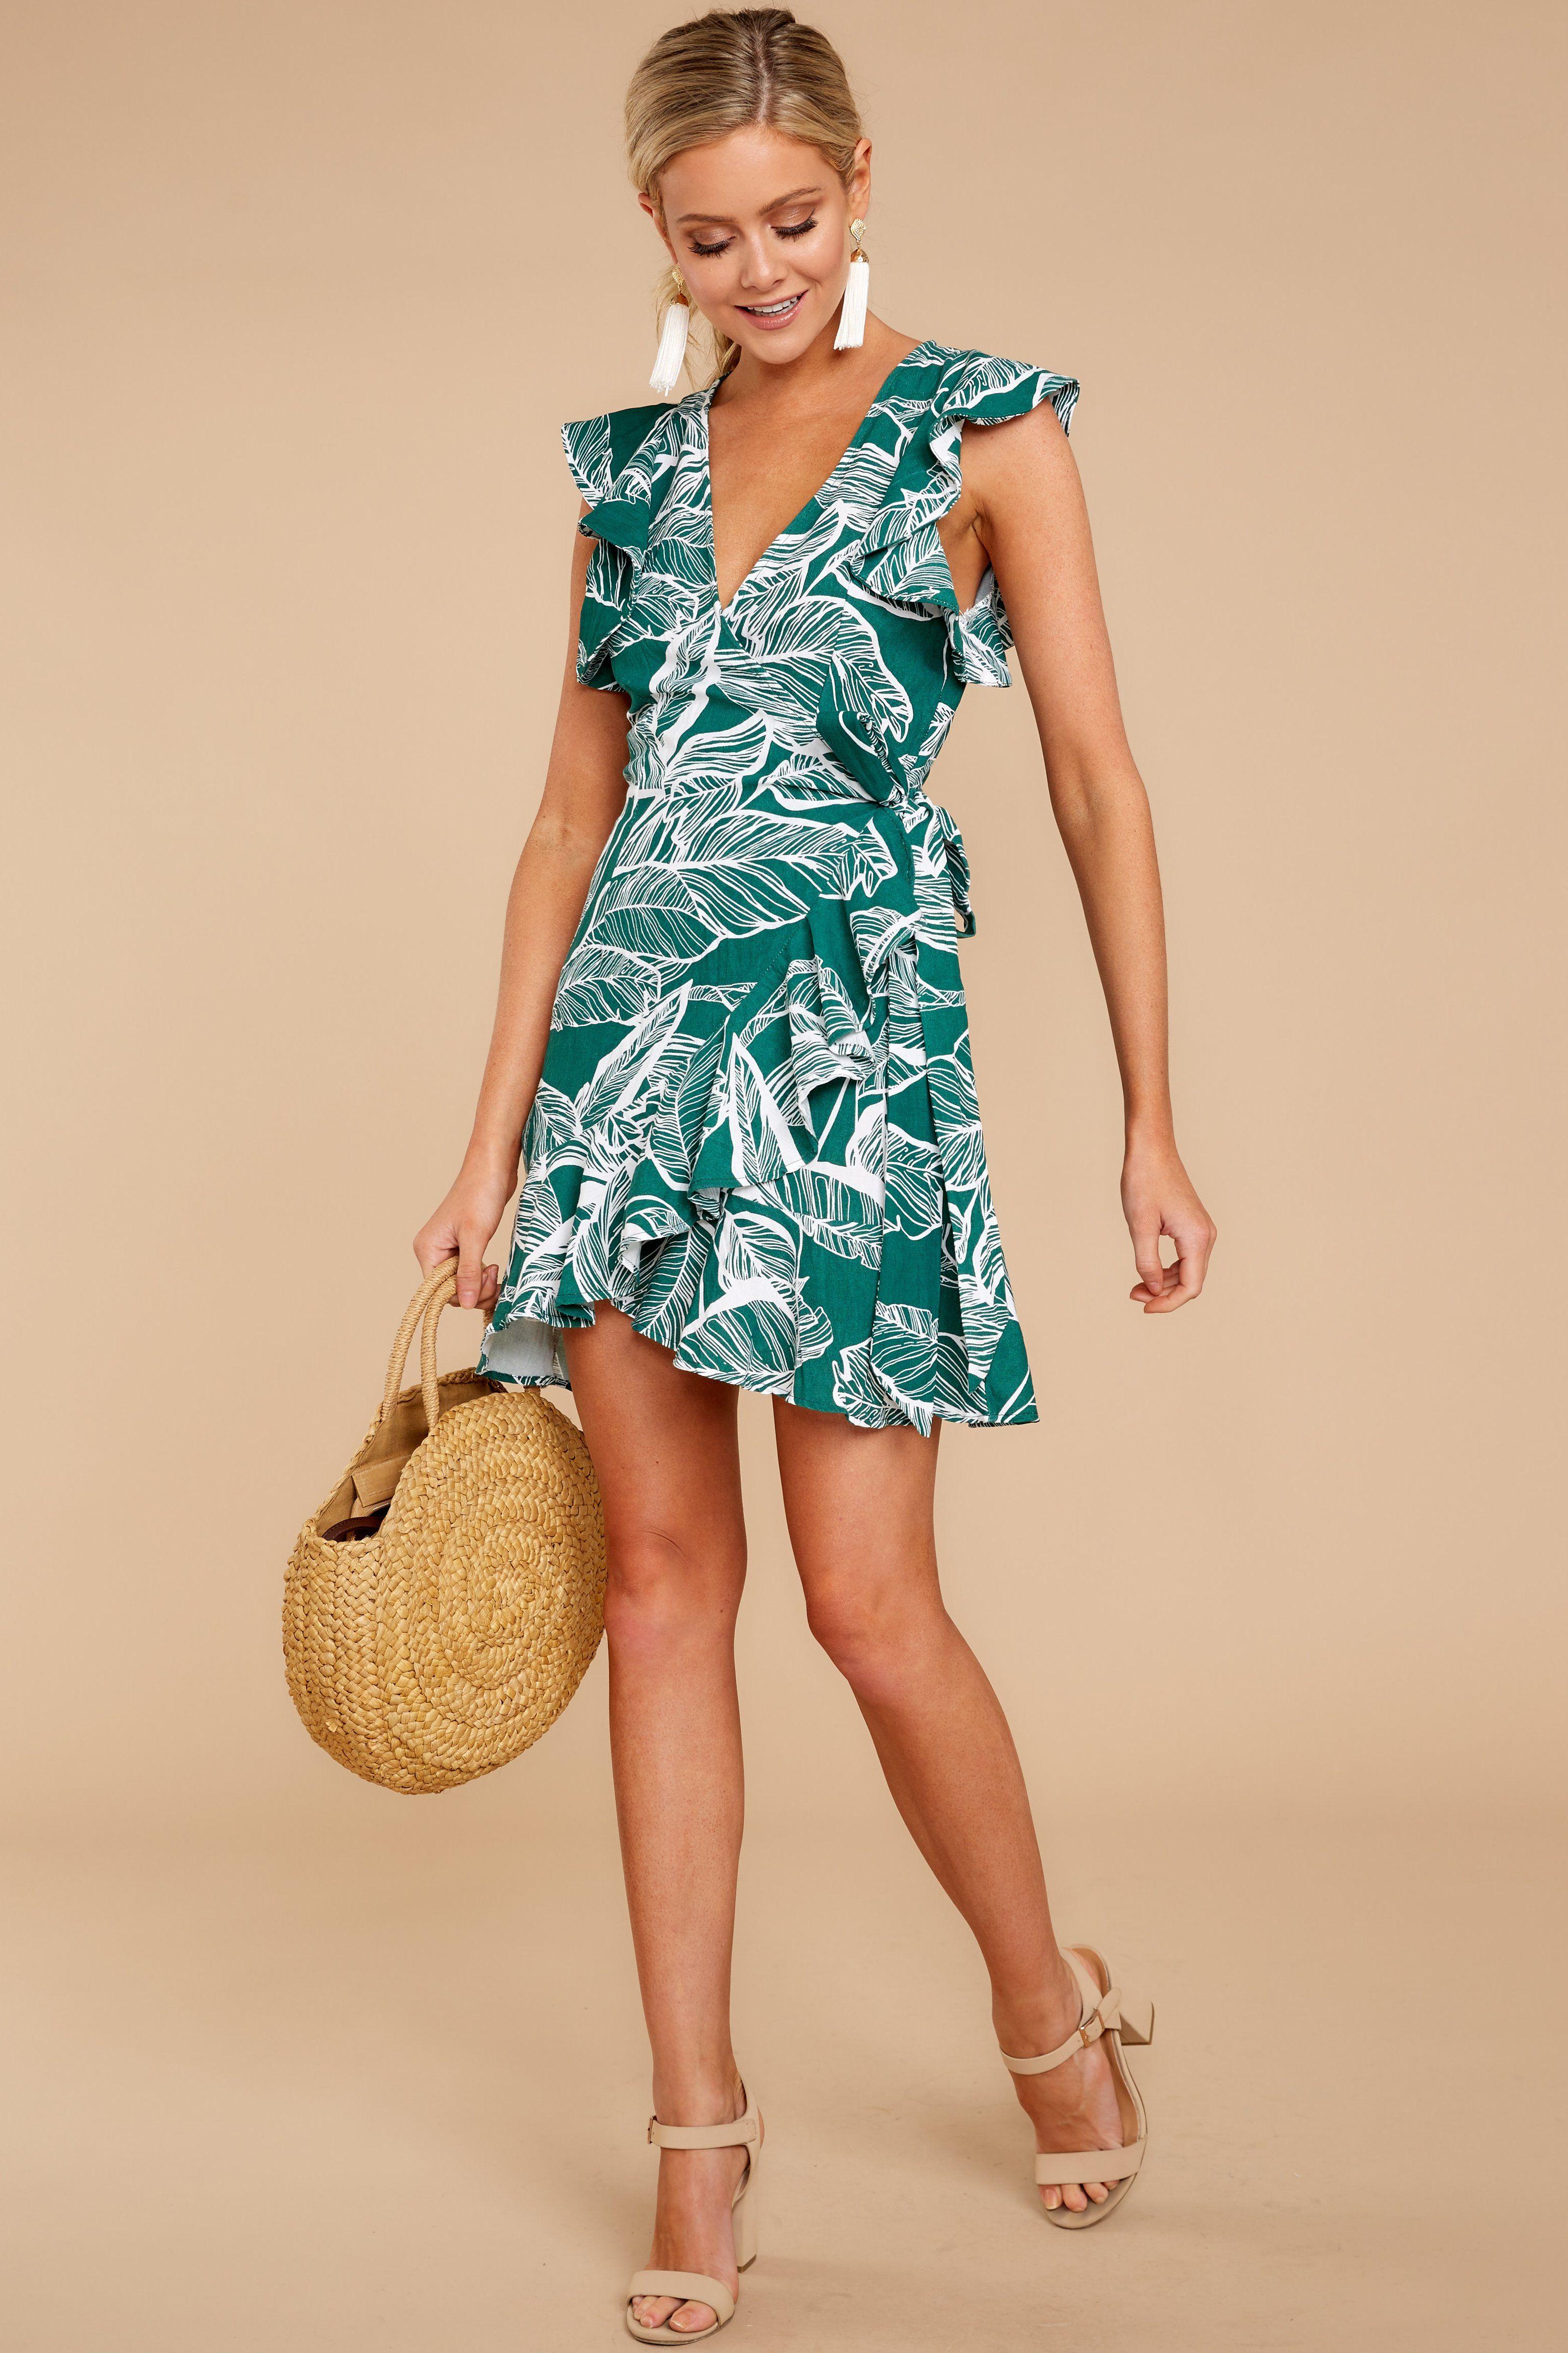 351e988c6d0c68 Trendy Green Wrap Dress - Tropical Print Dress - Short Dress -  44.00 – Red  Dress Boutique